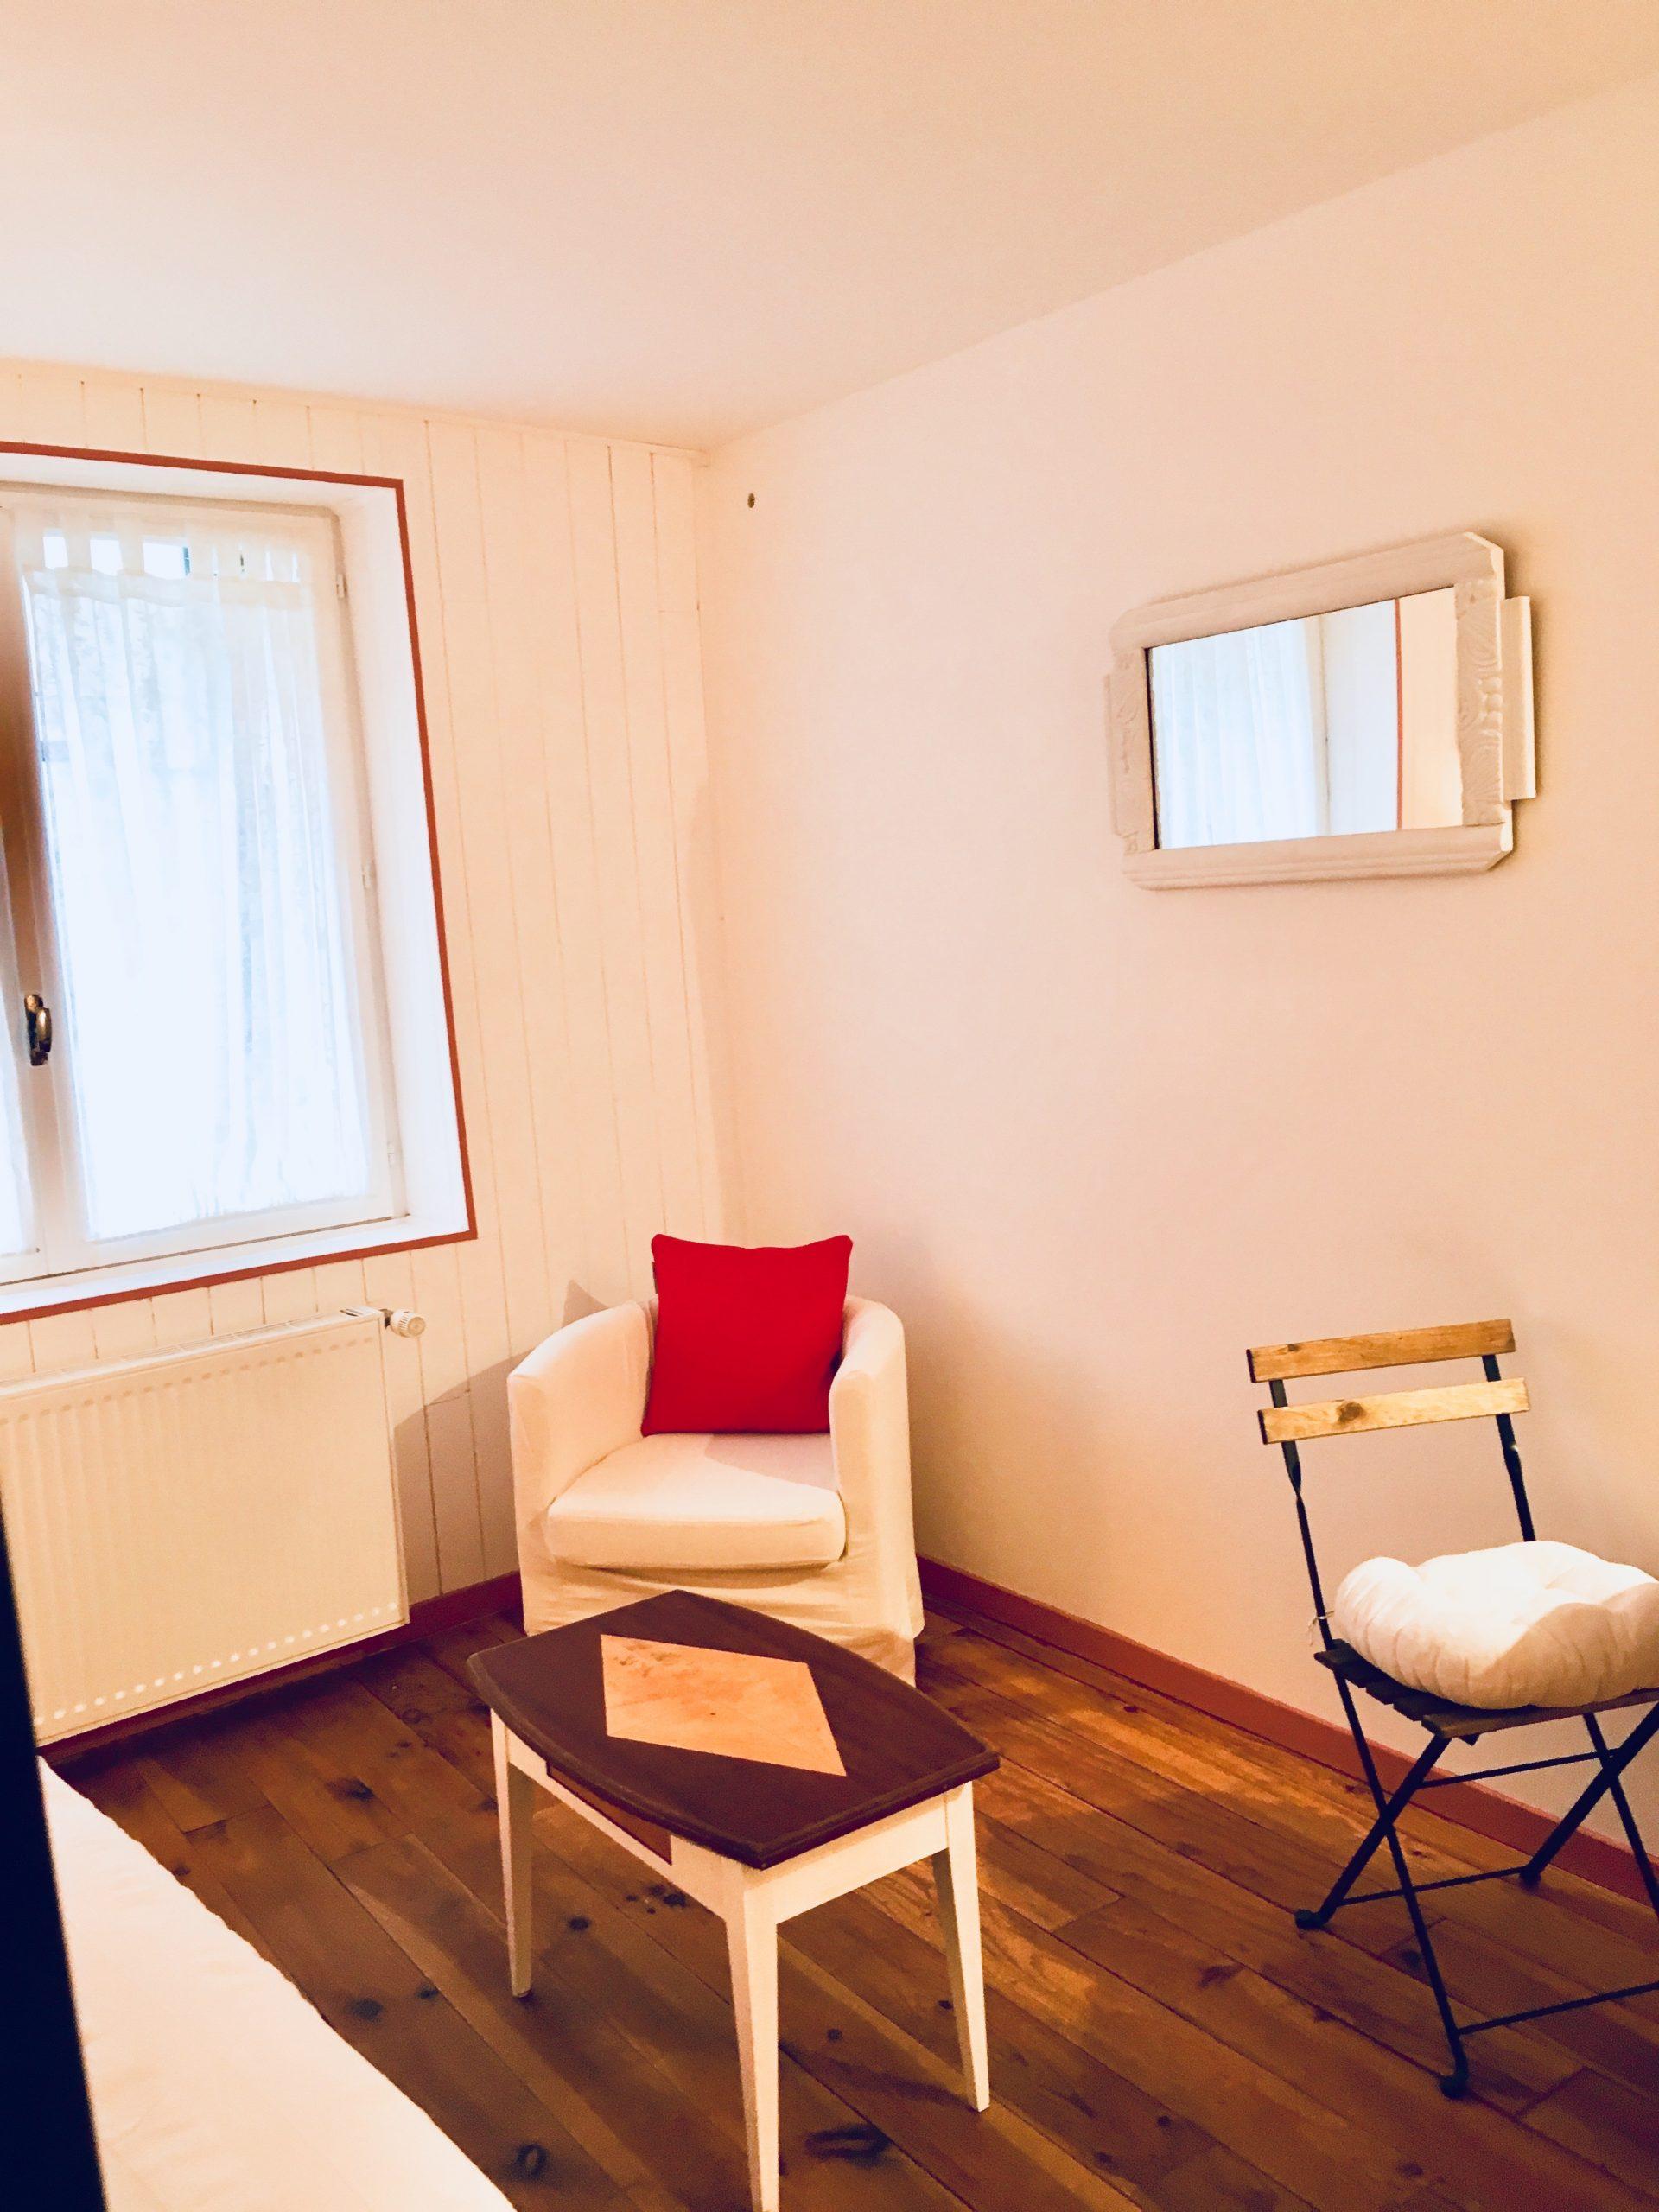 Appartement 1, salon